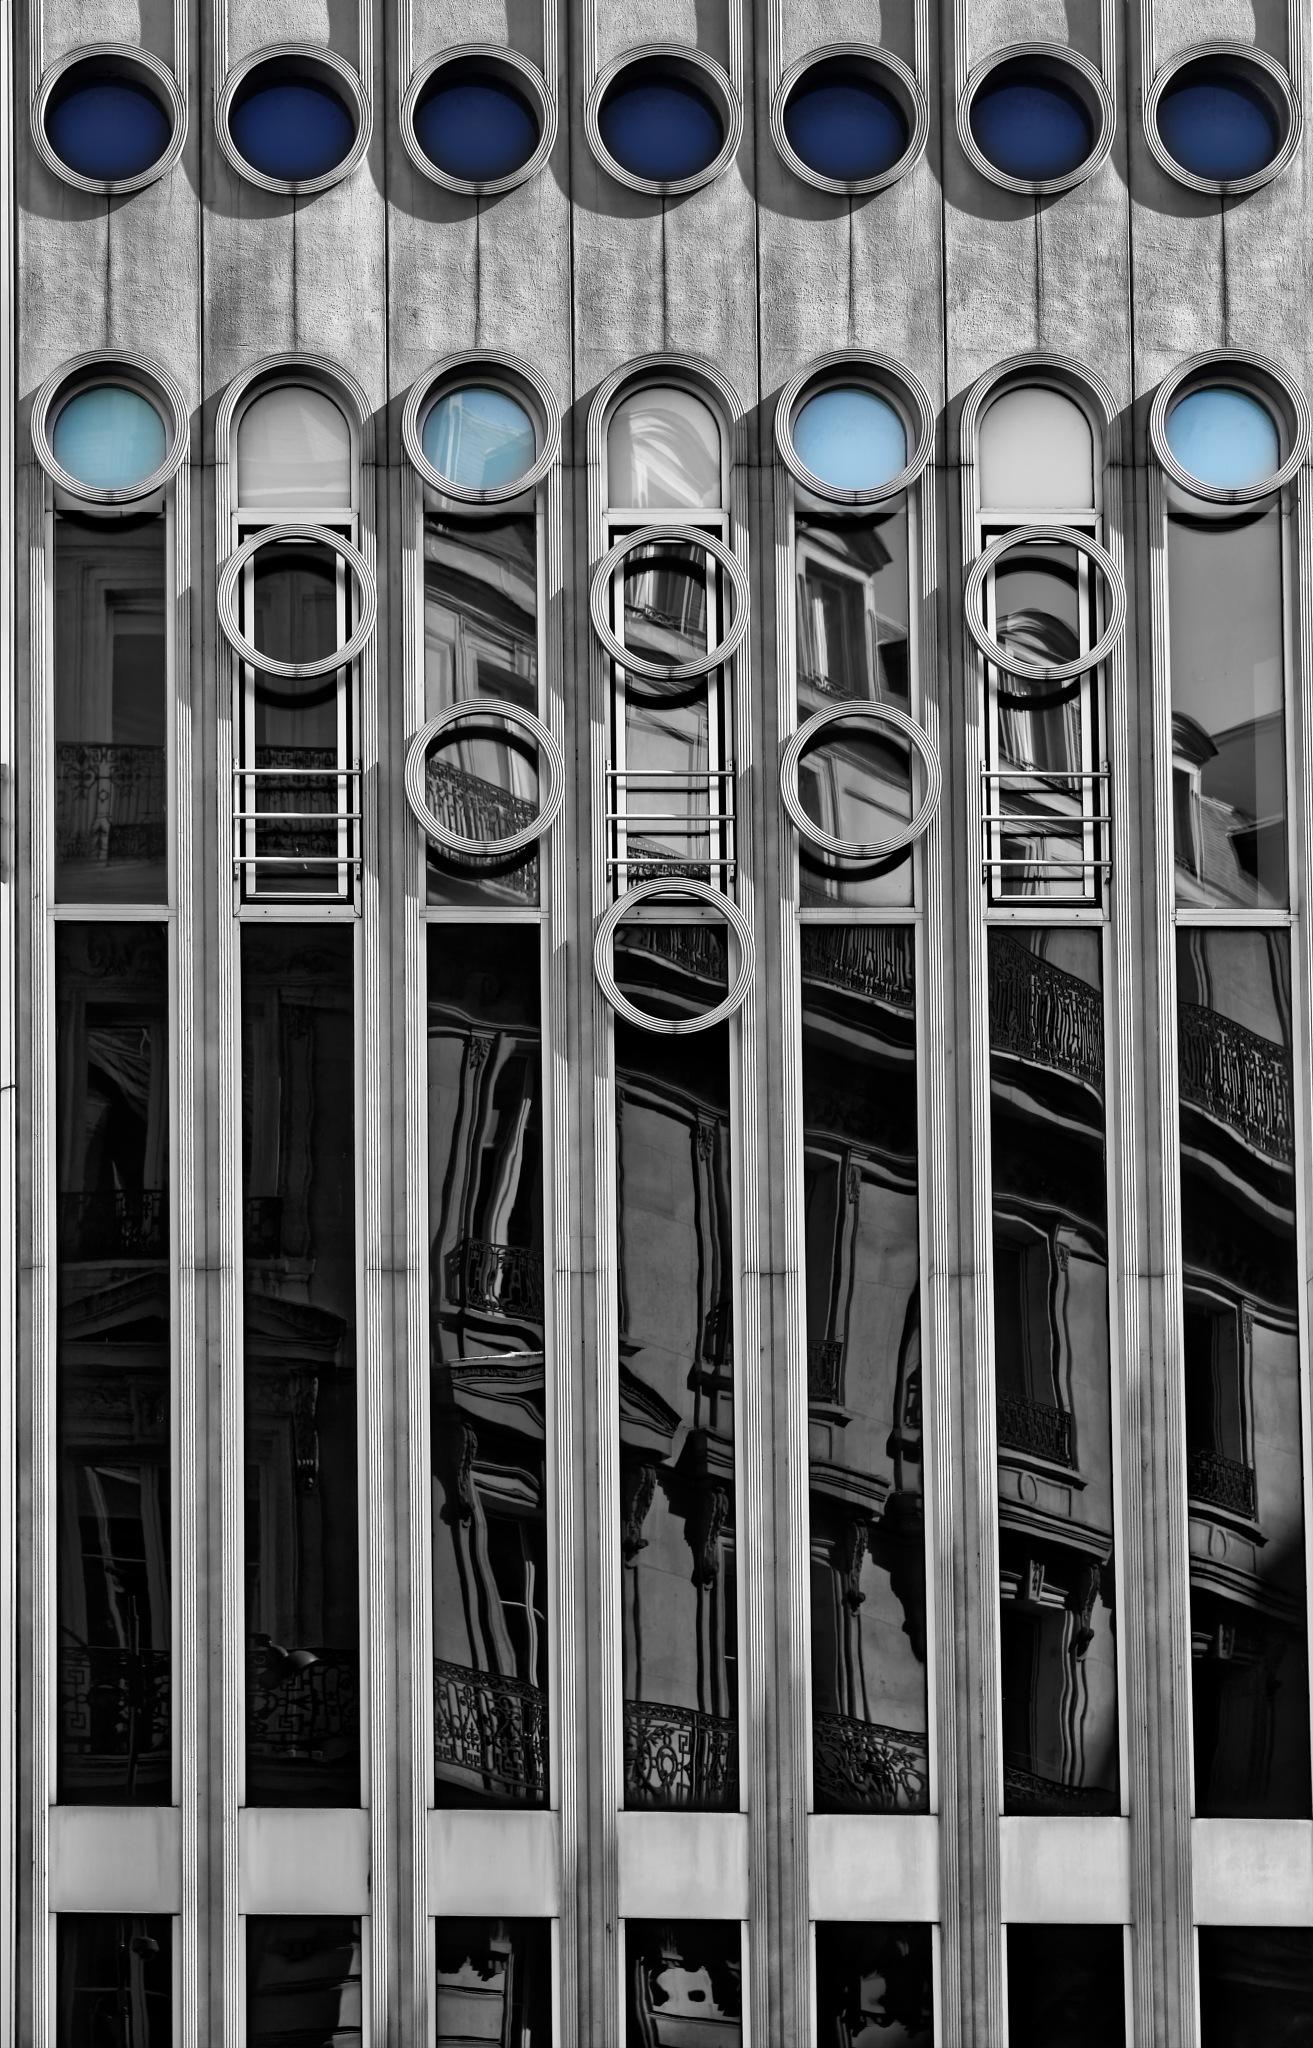 Modern & old  by Nik Phot